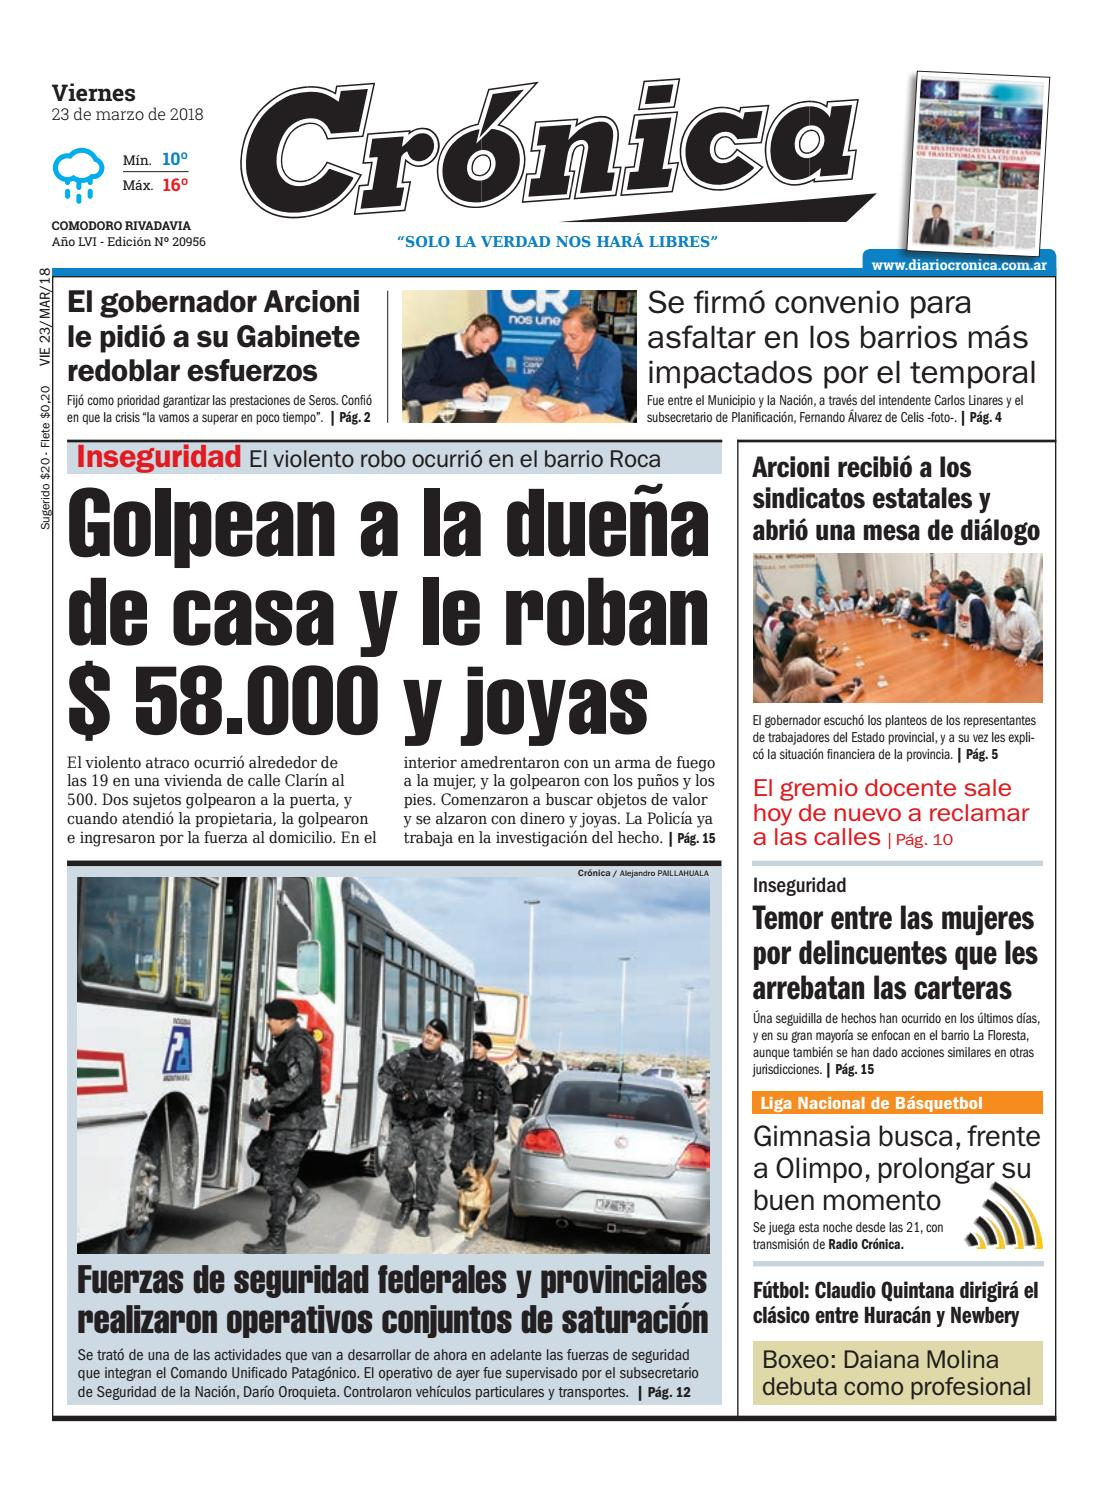 0518c401f8595d0363a319de373a1731 by Diario Crónica - issuu e1d55ce2660